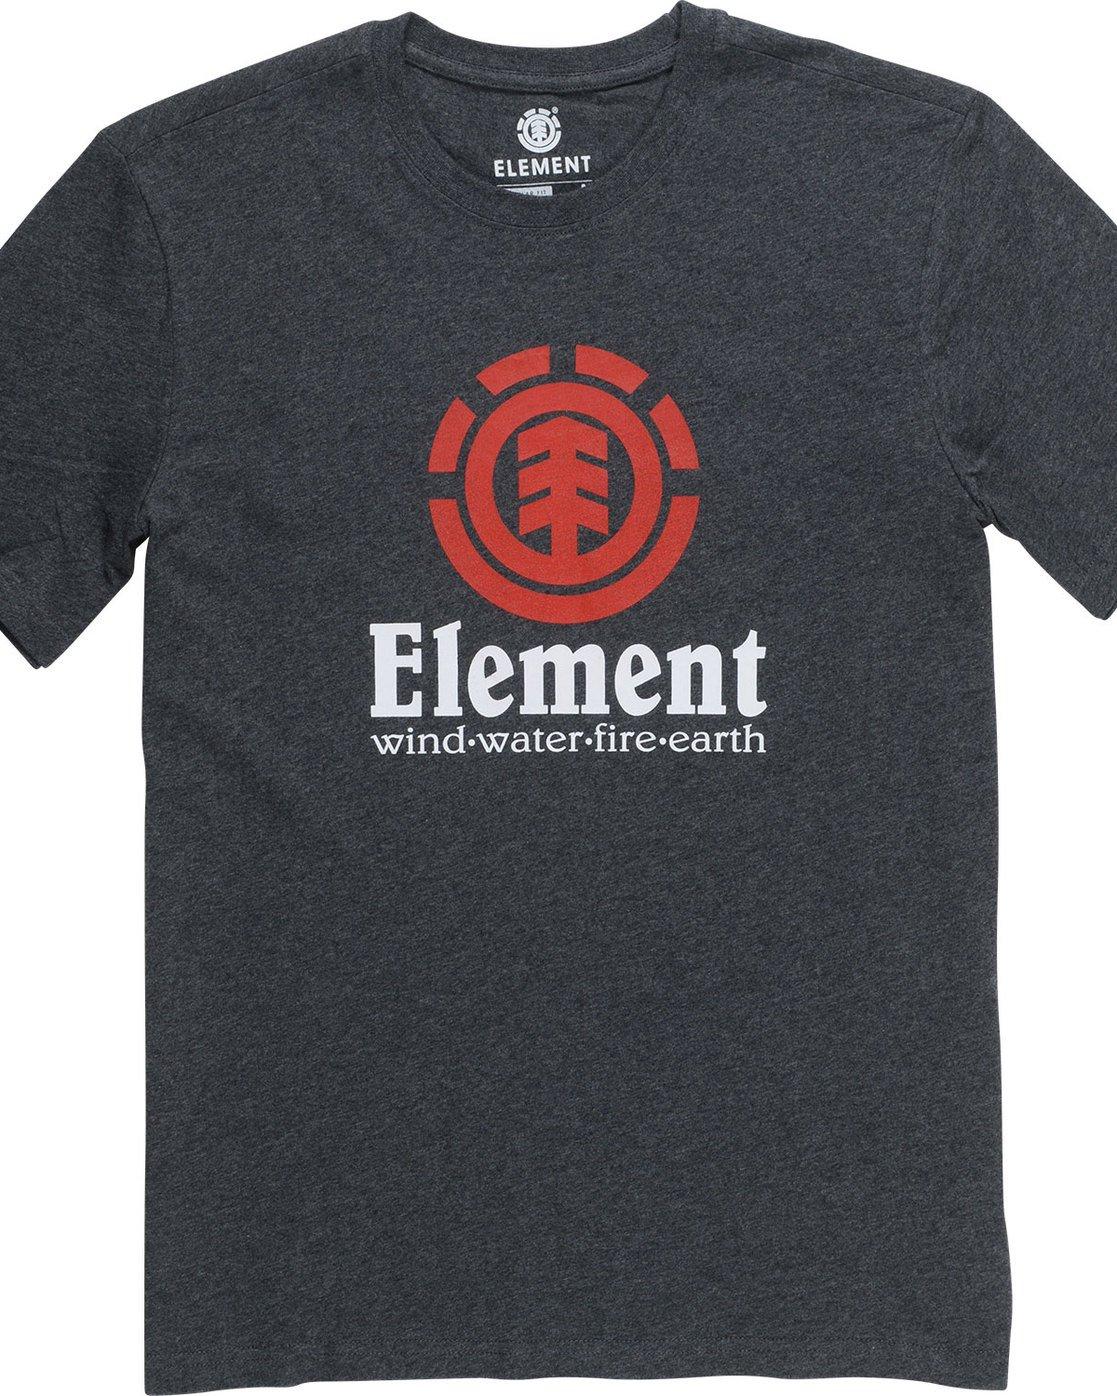 Element Vertical Tee Eclipse Navy Element Men/'s Clothing T-Shirts